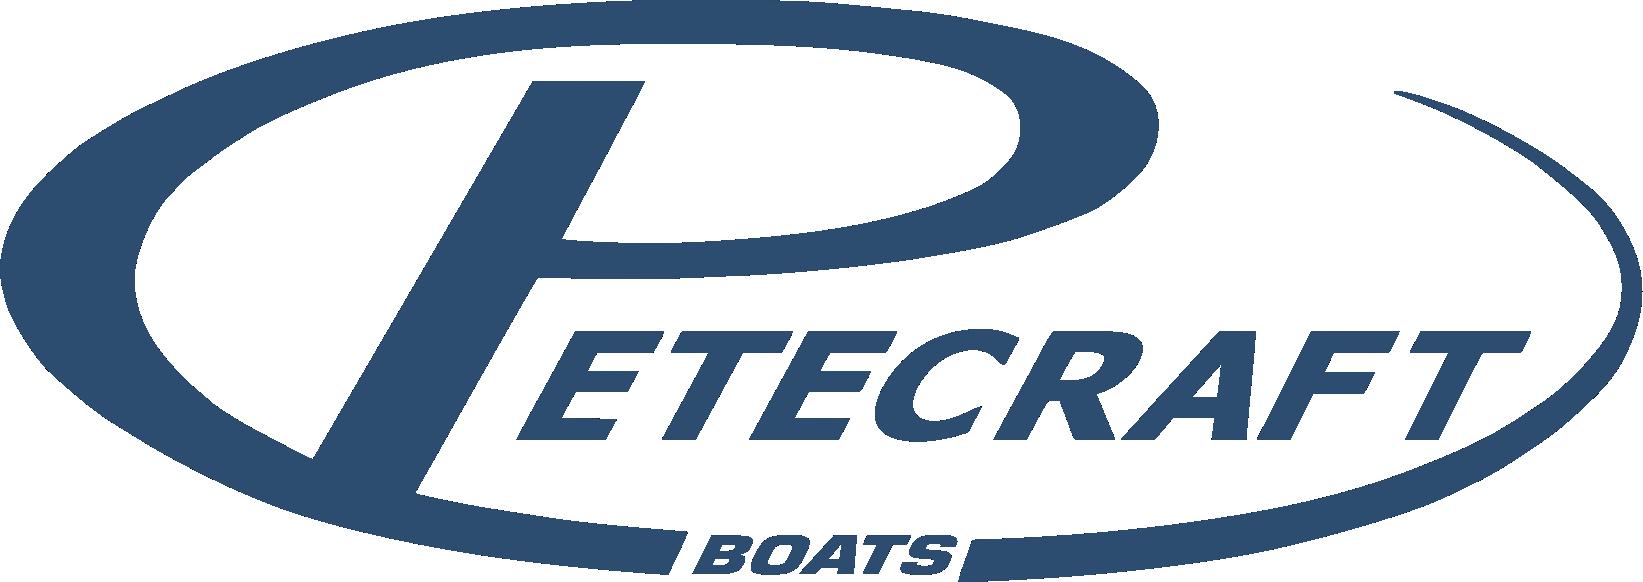 Petecraft logo